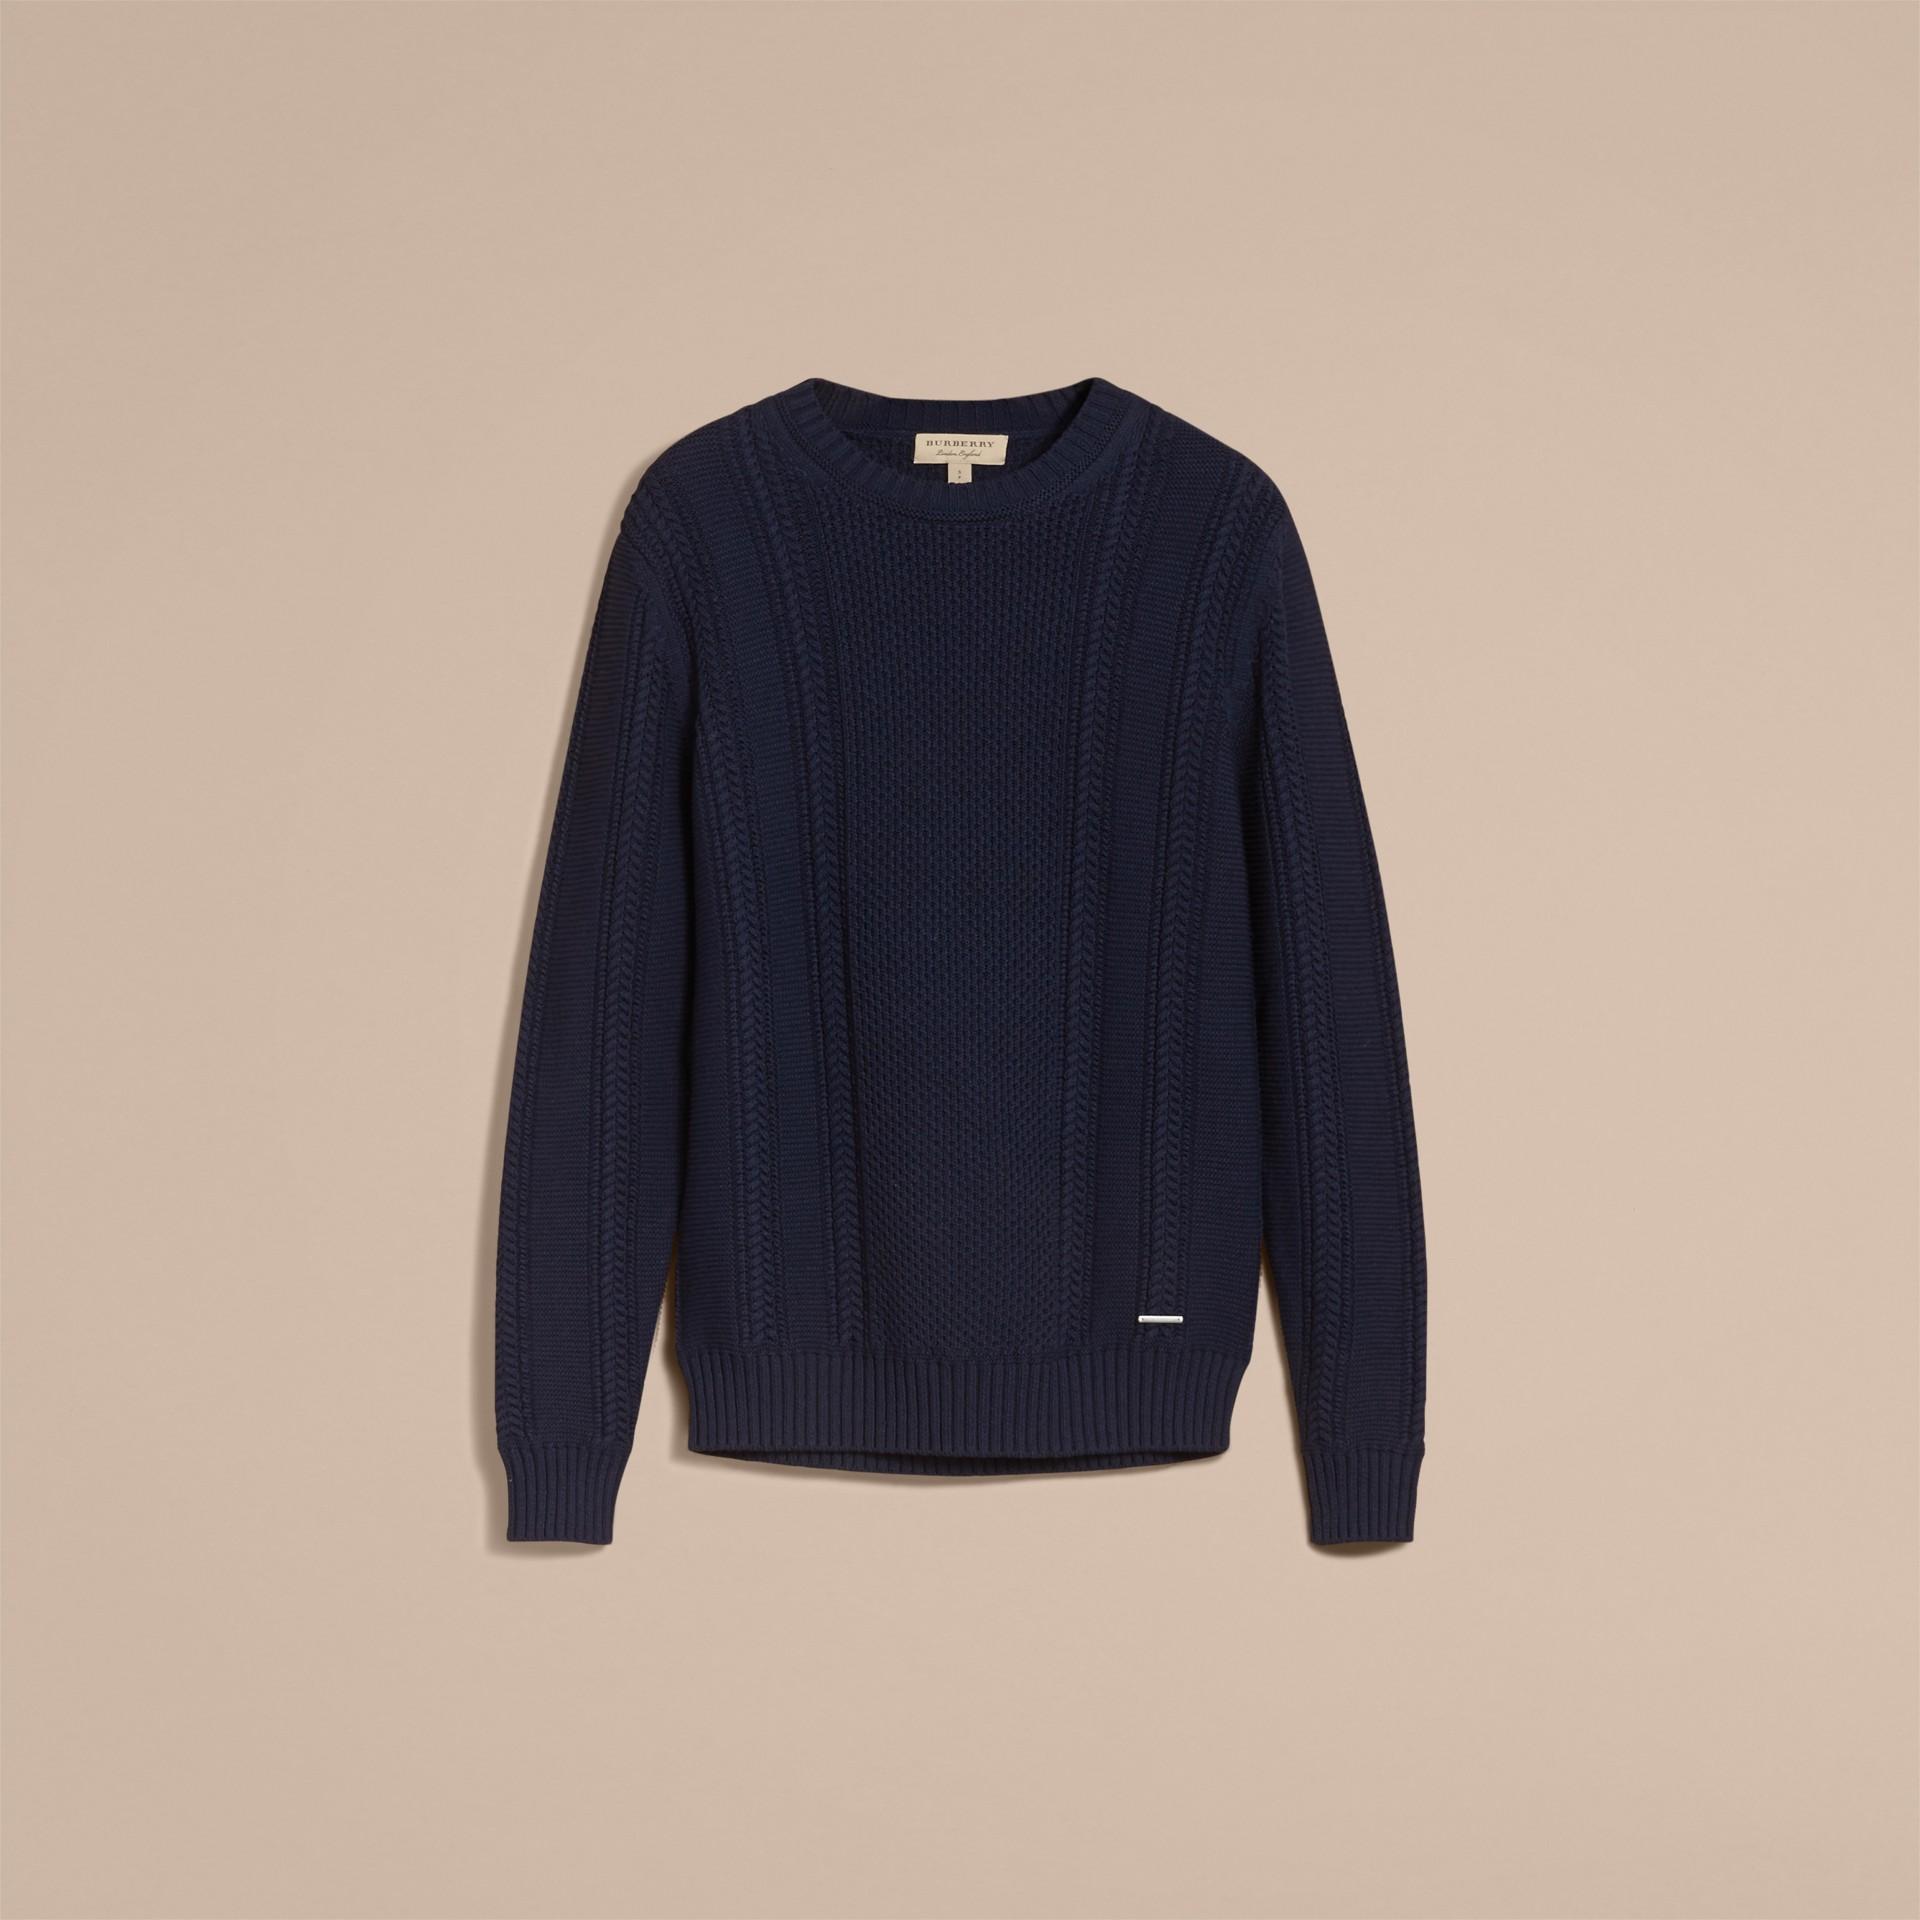 Zip Detail Aran Knit Cotton Sweater - gallery image 4